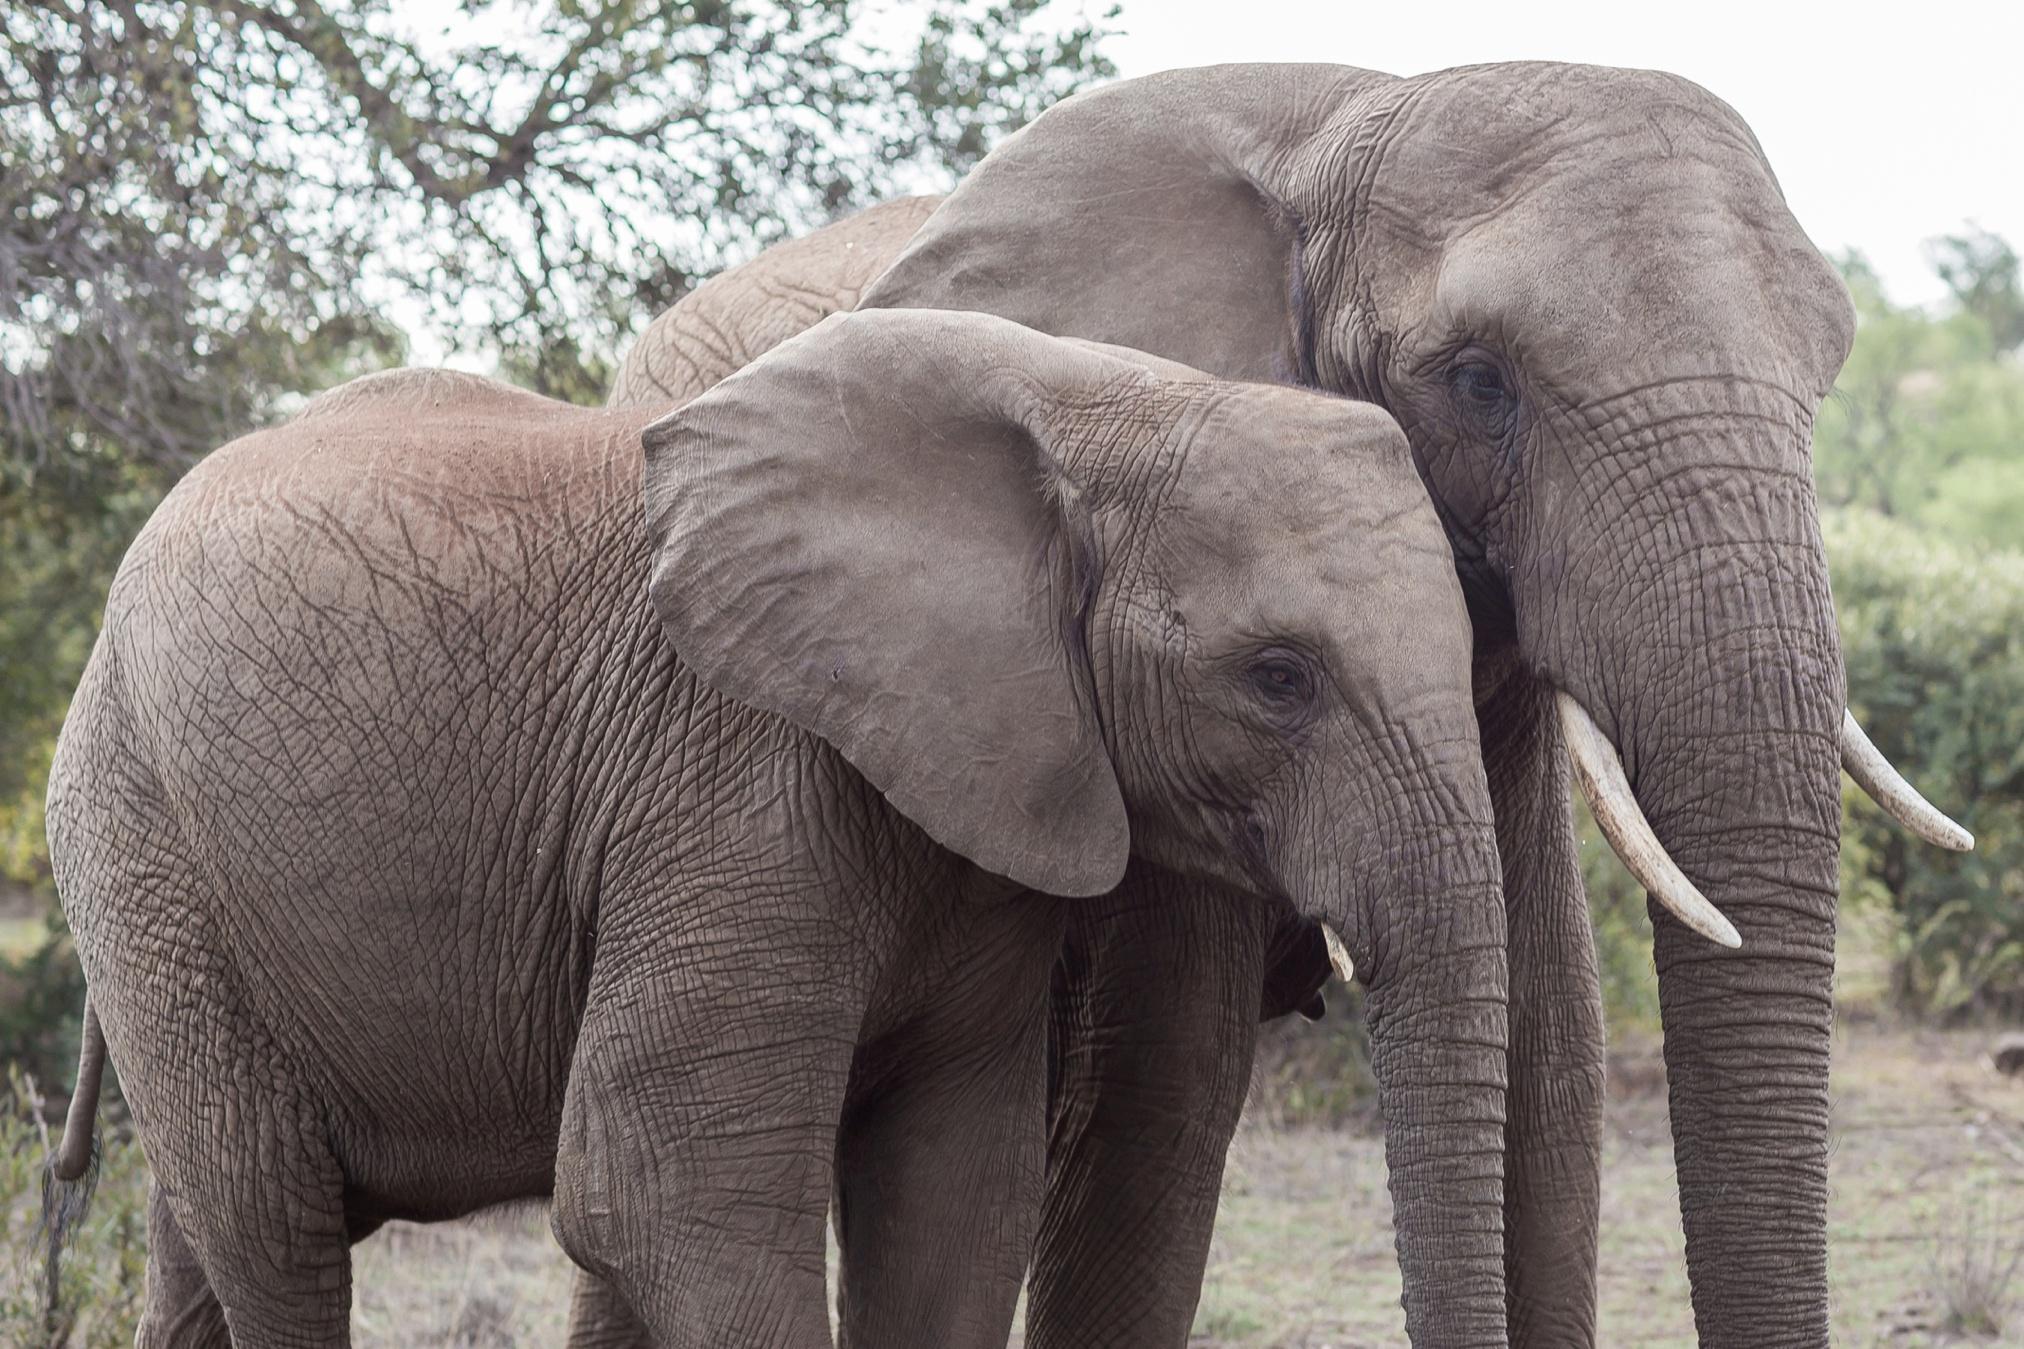 Glen_Afric_Kyle_and_Lindsay_engagement_elephants_safari_7